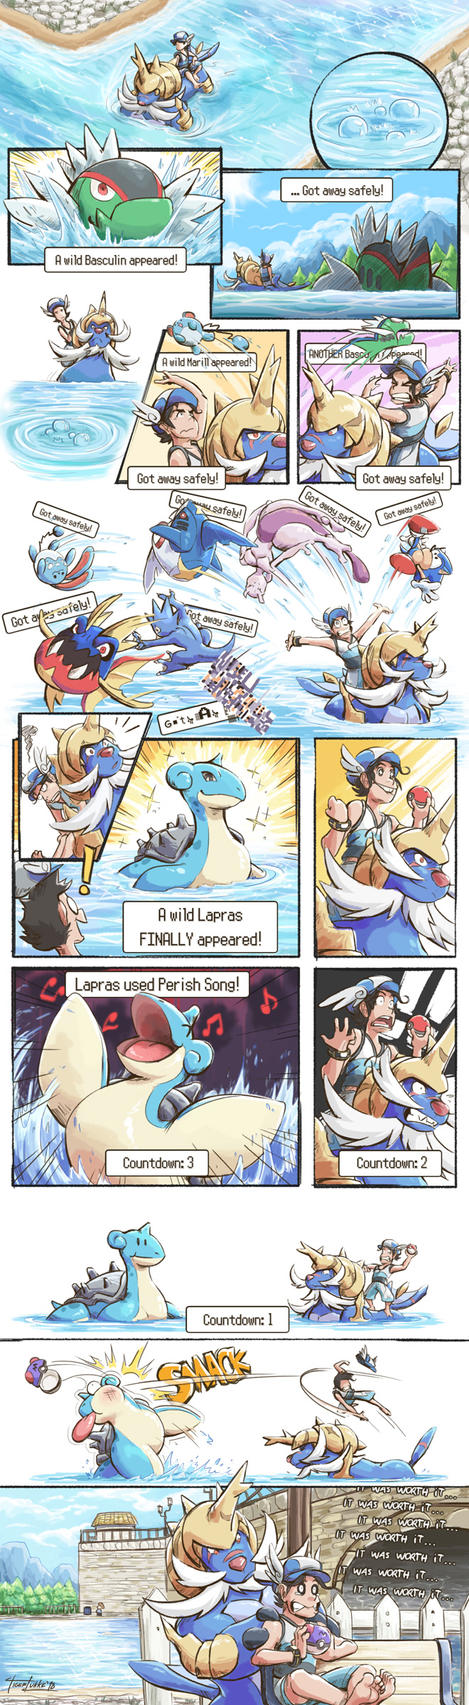 Pokemoments: Low Chances by TigerLukke